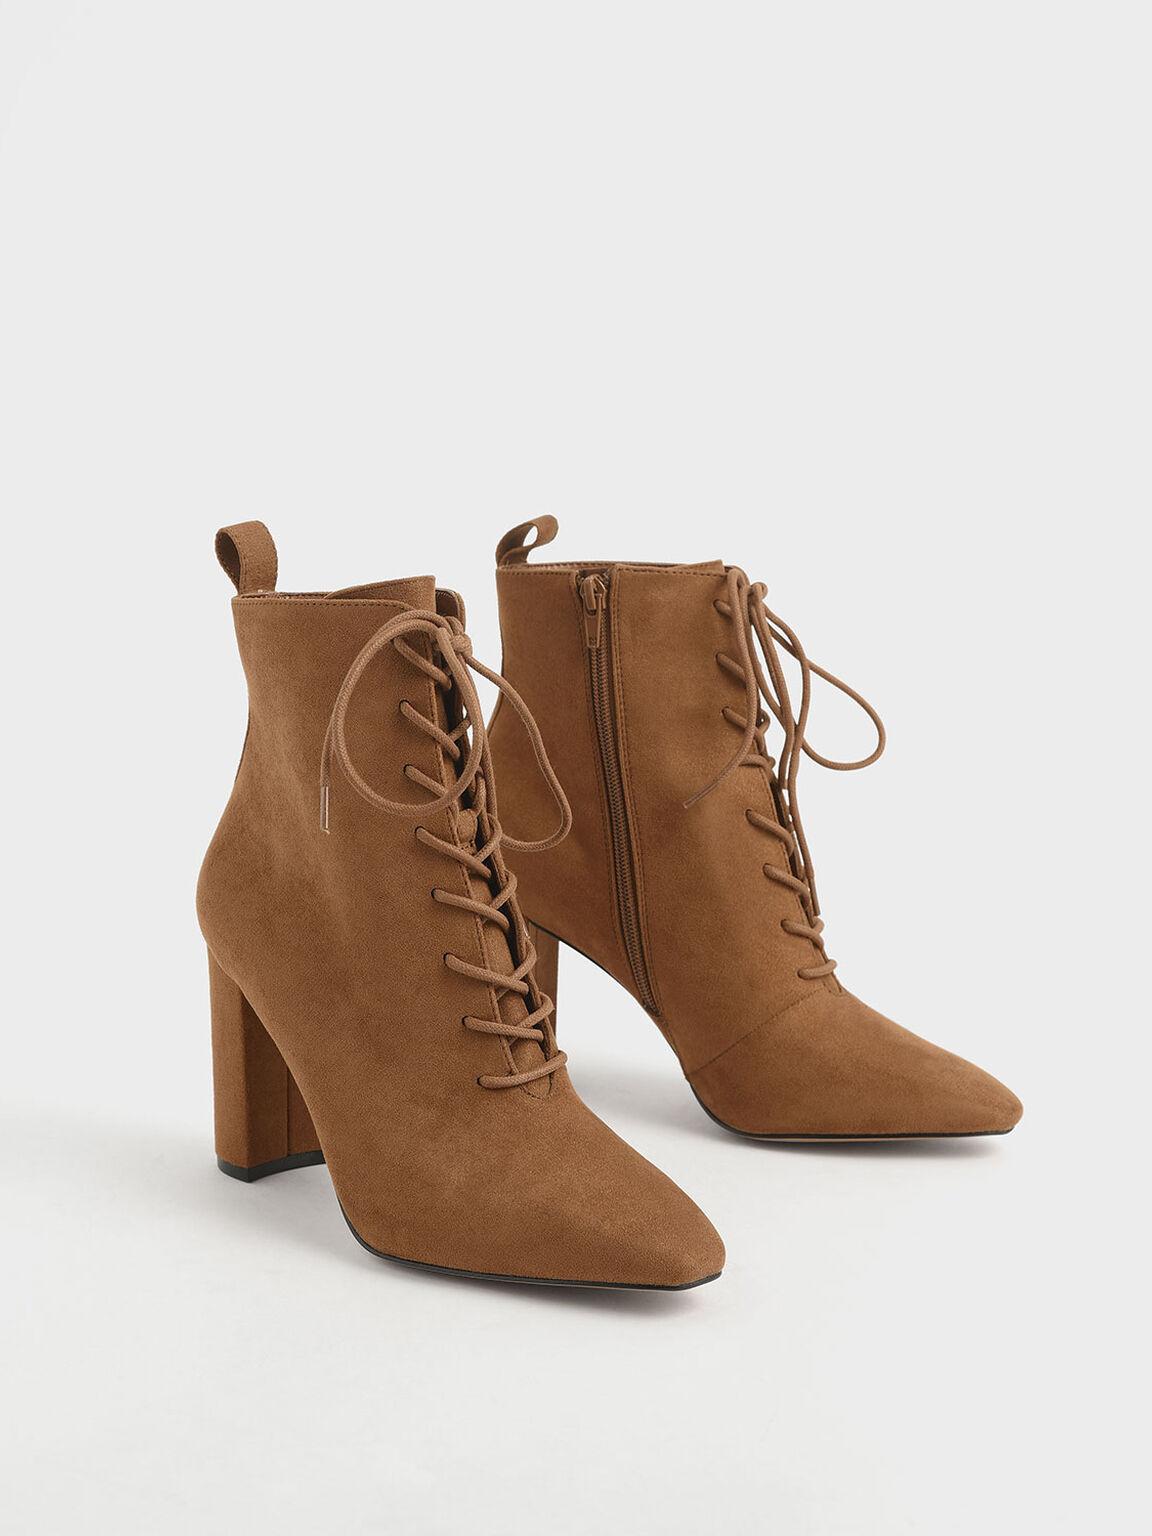 綁帶高跟短靴, 焦糖色, hi-res